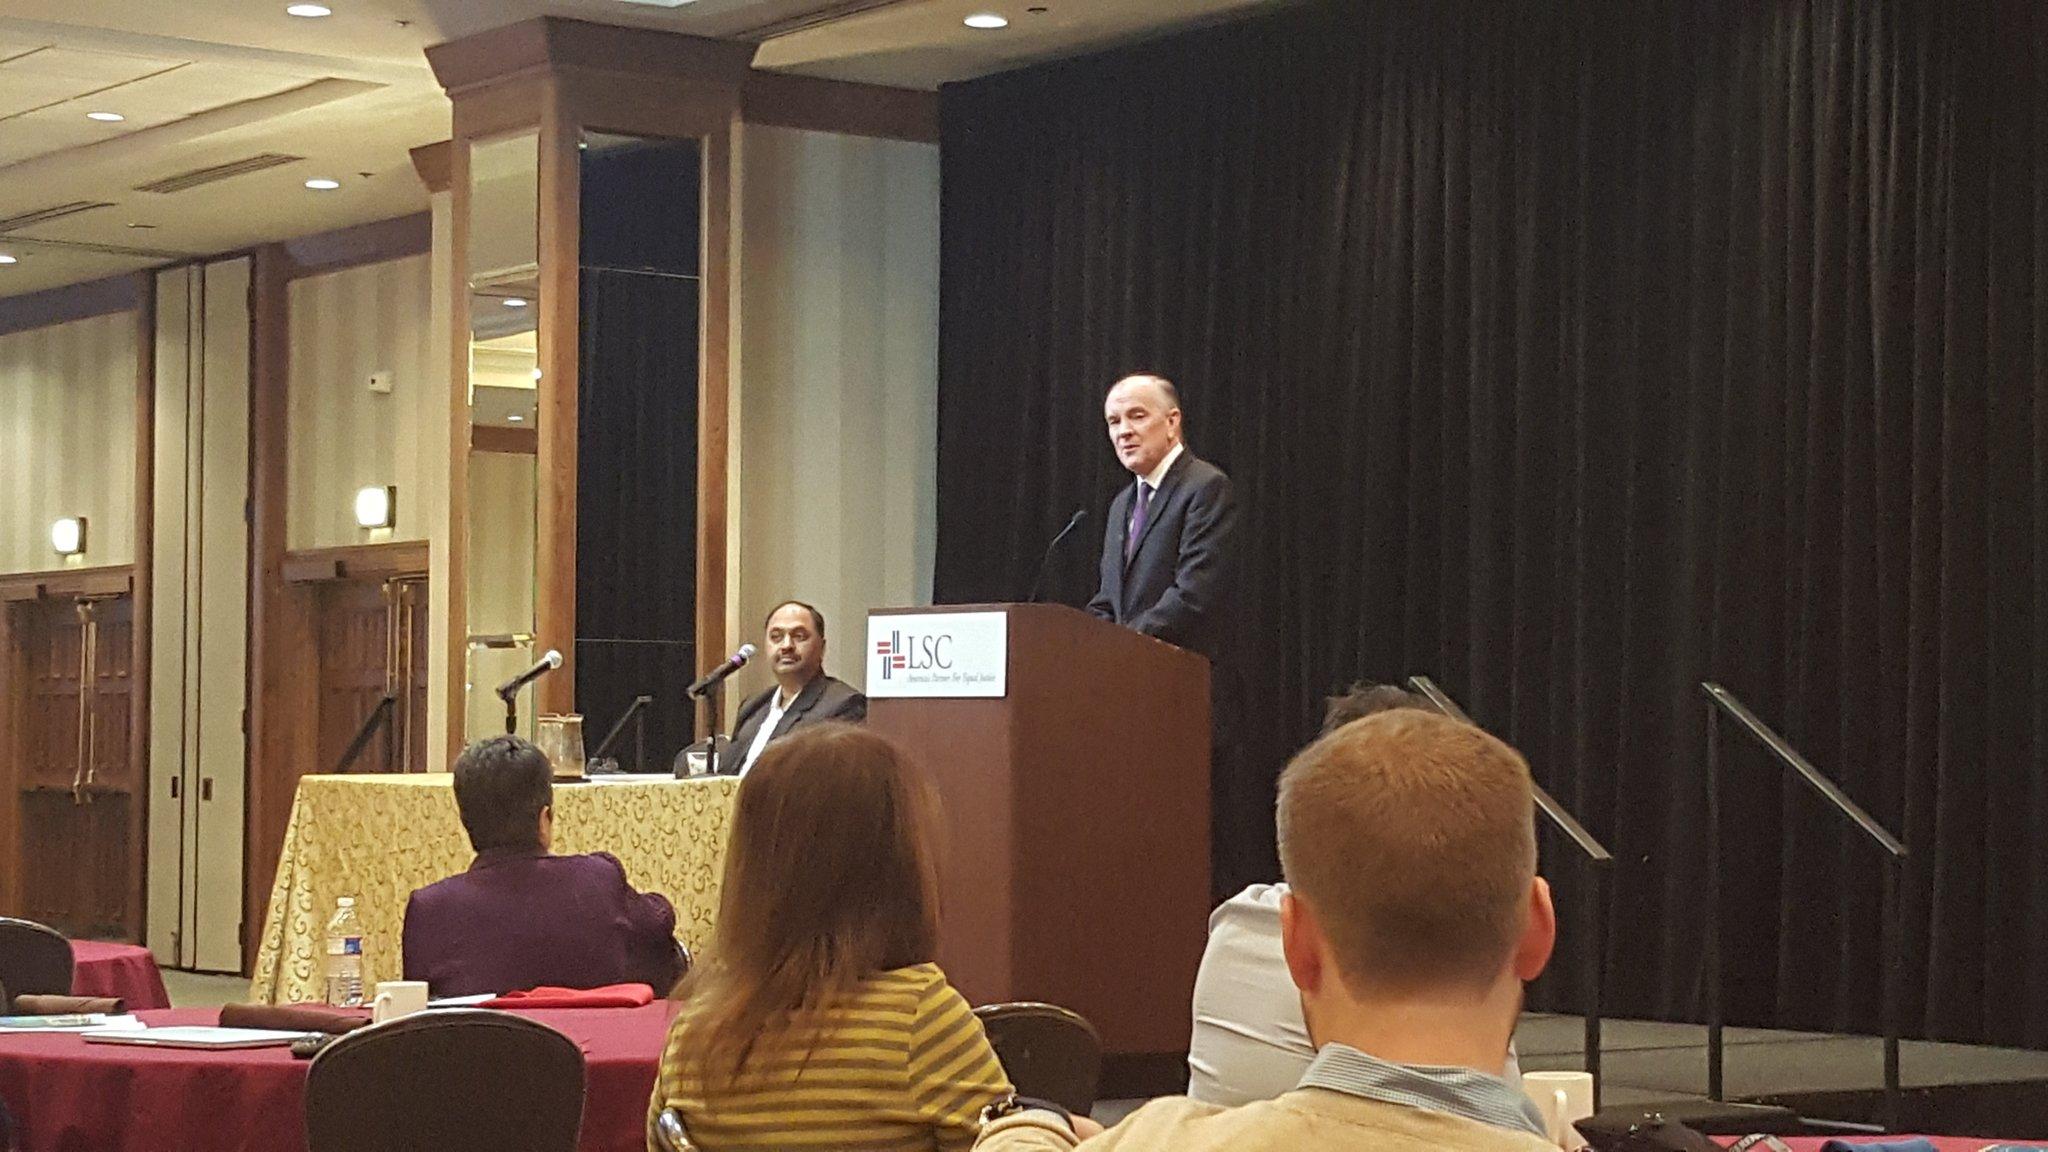 Opening remarks from Jim Sandman @LSCtweets to kick off #tig2017 conference. #LSCTIG https://t.co/2tLMb0YVJa